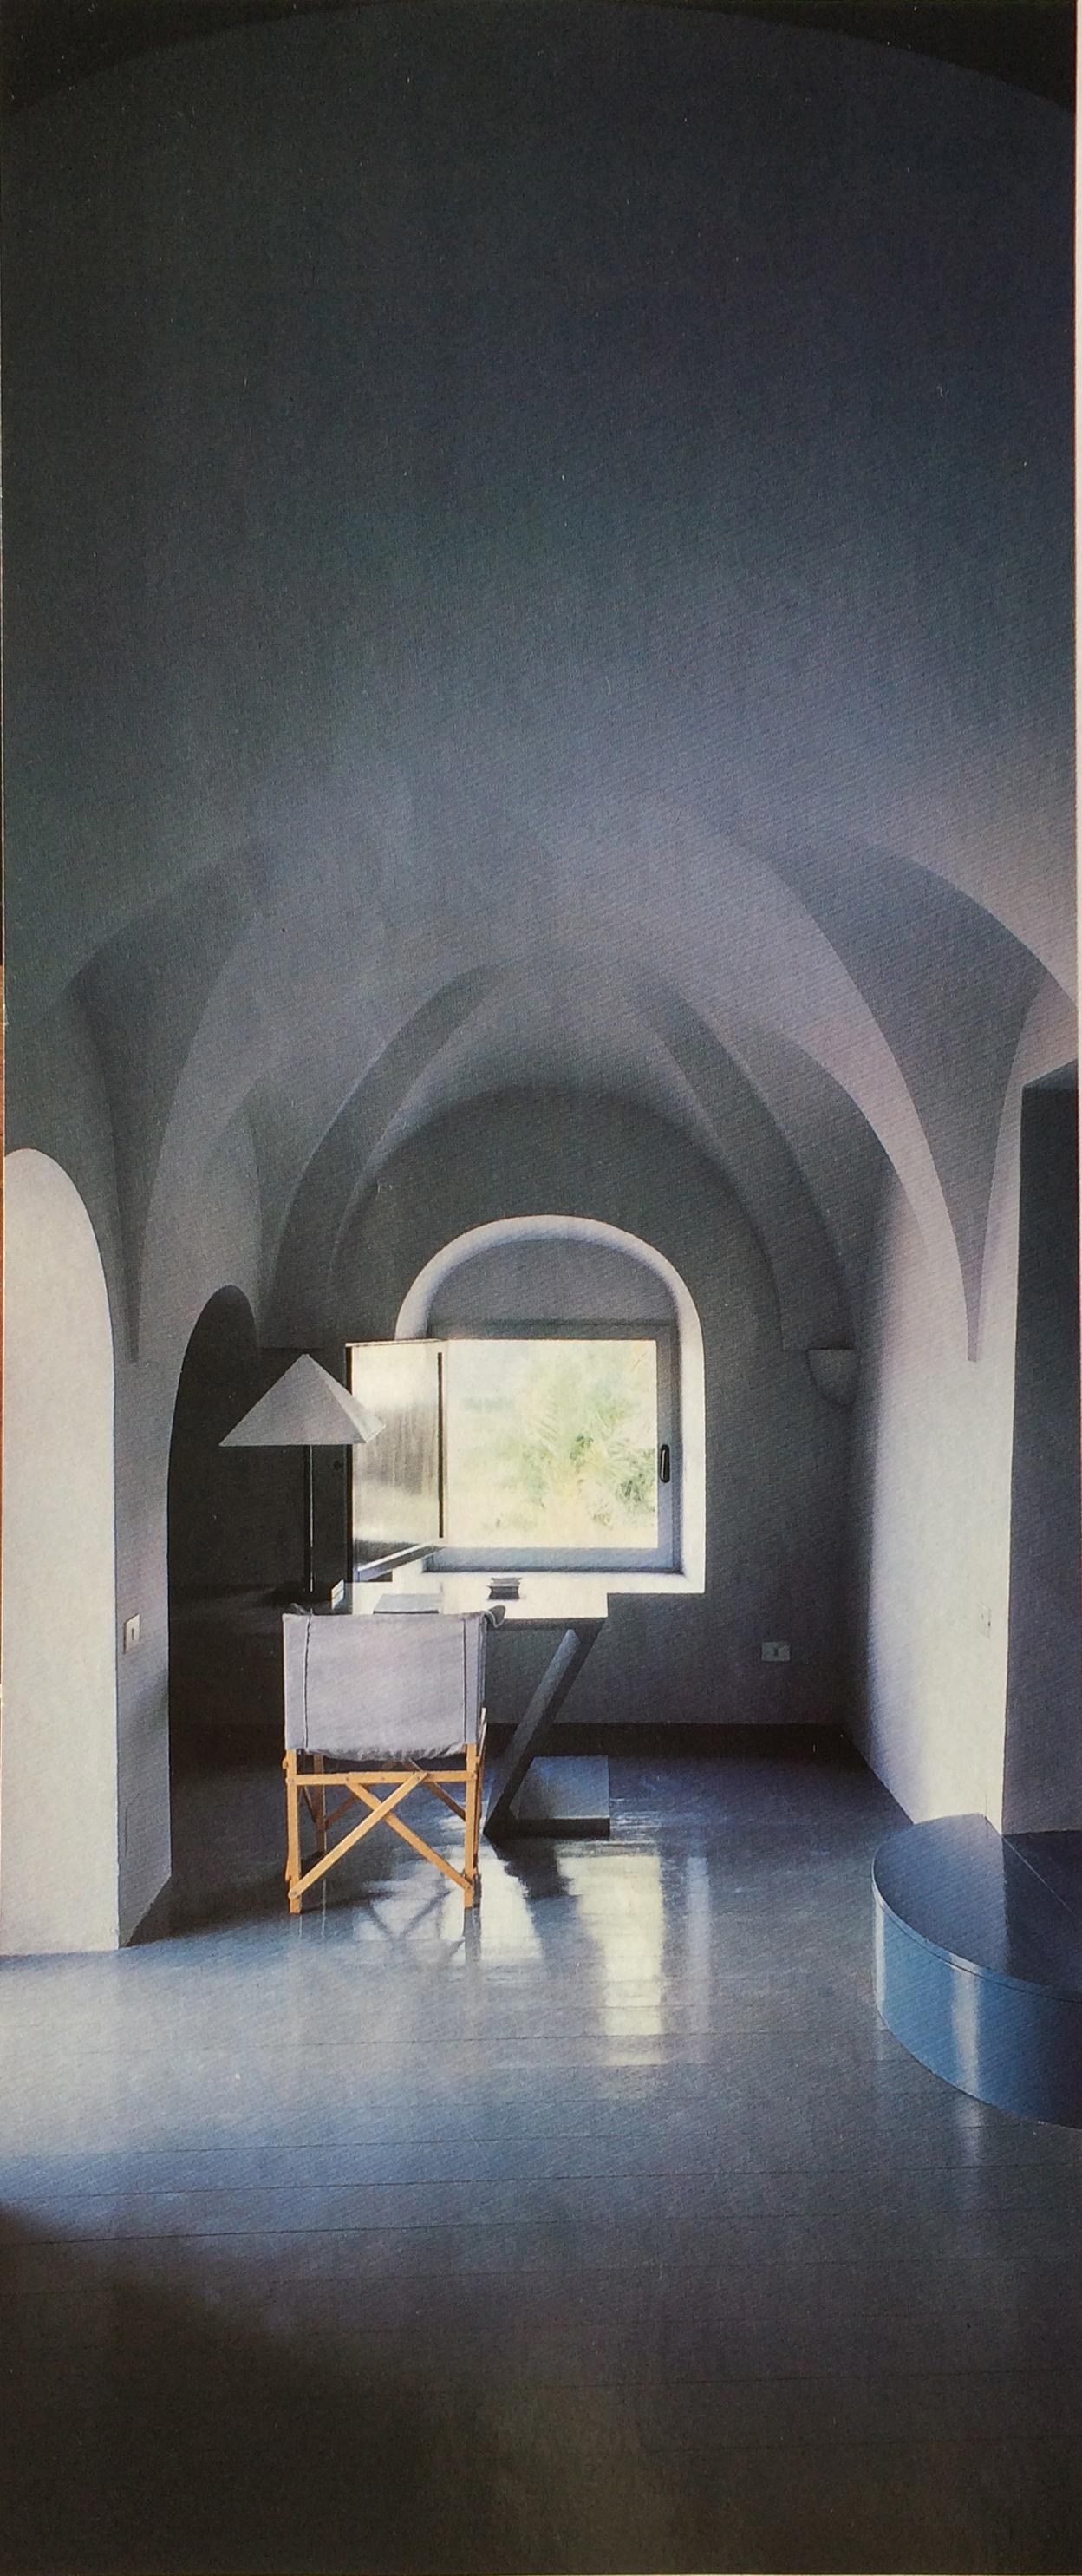 Giorgio Armani's home